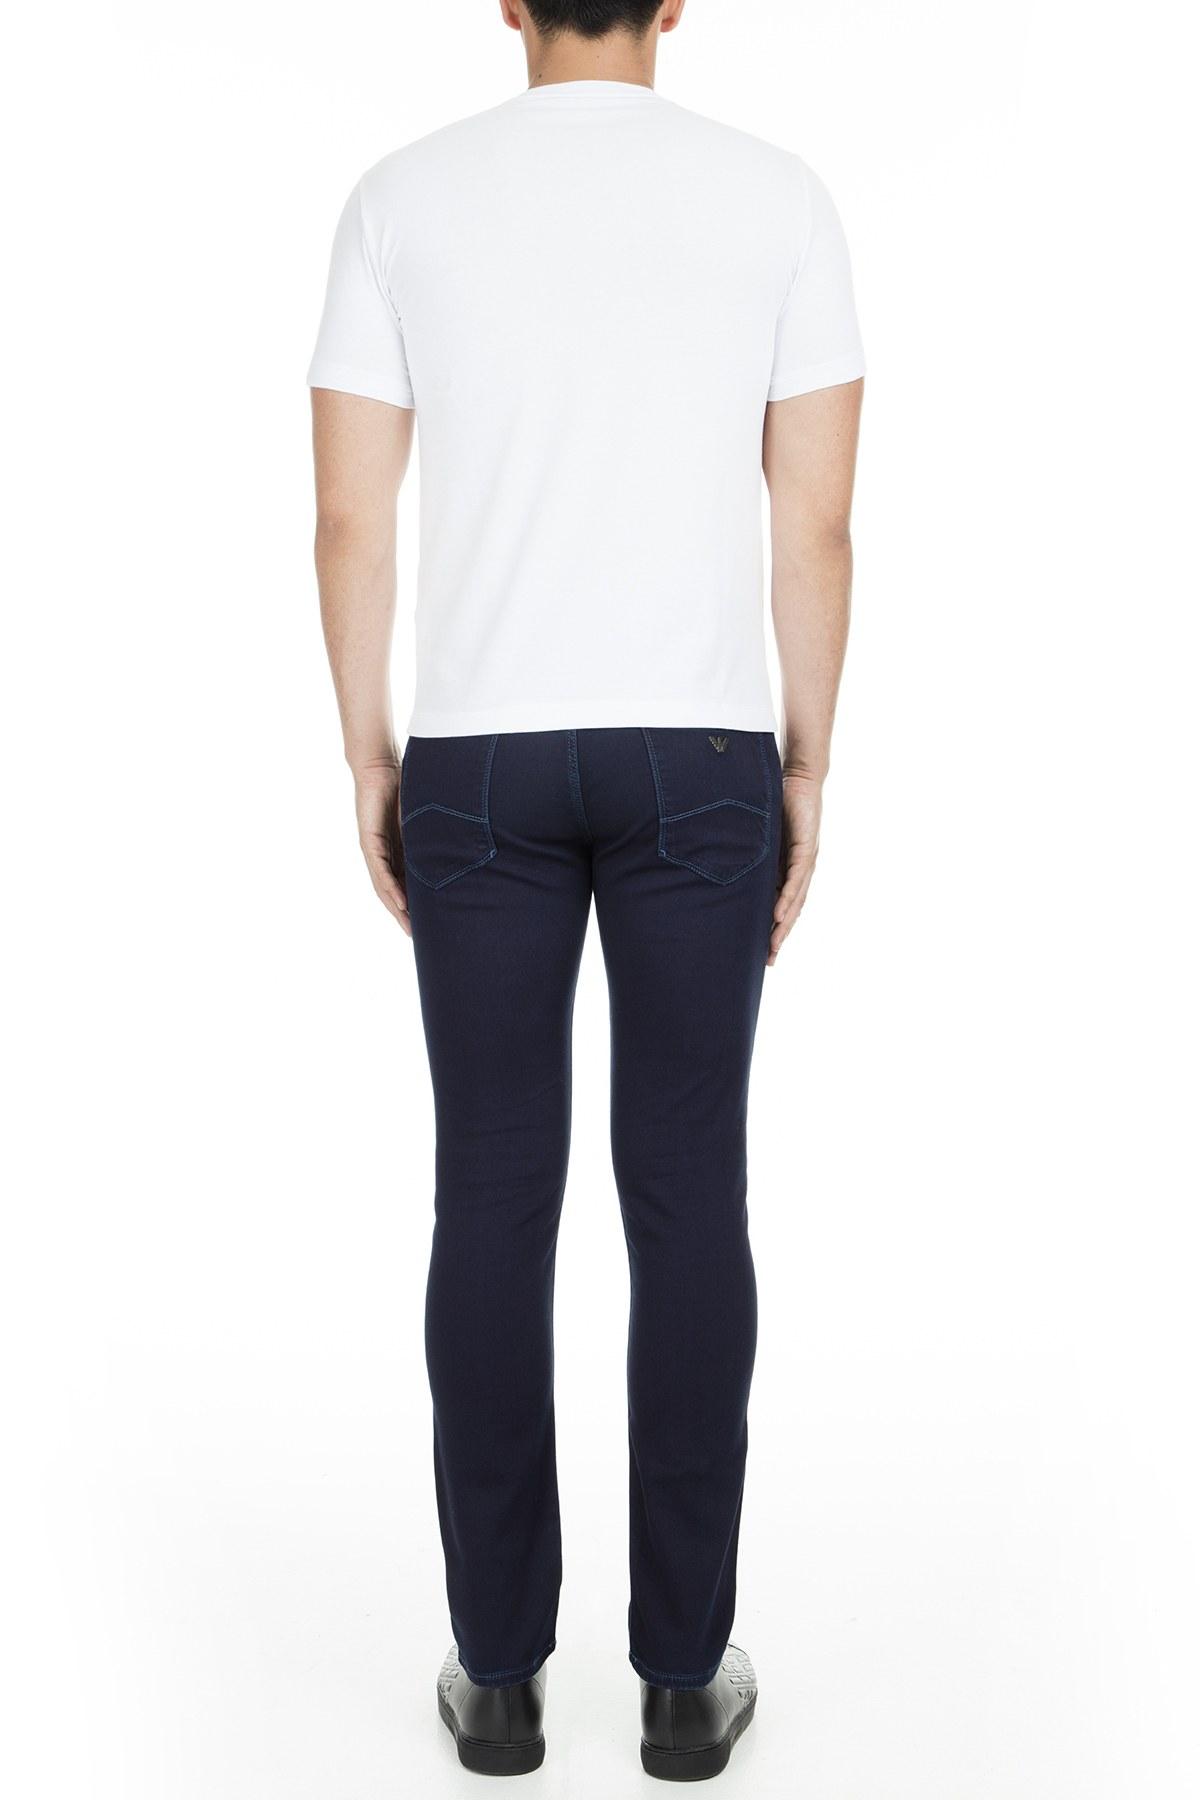 Emporio Armani J06 Jeans Erkek Kot Pantolon 3G1J06 1D0PZ 0942 LACİVERT